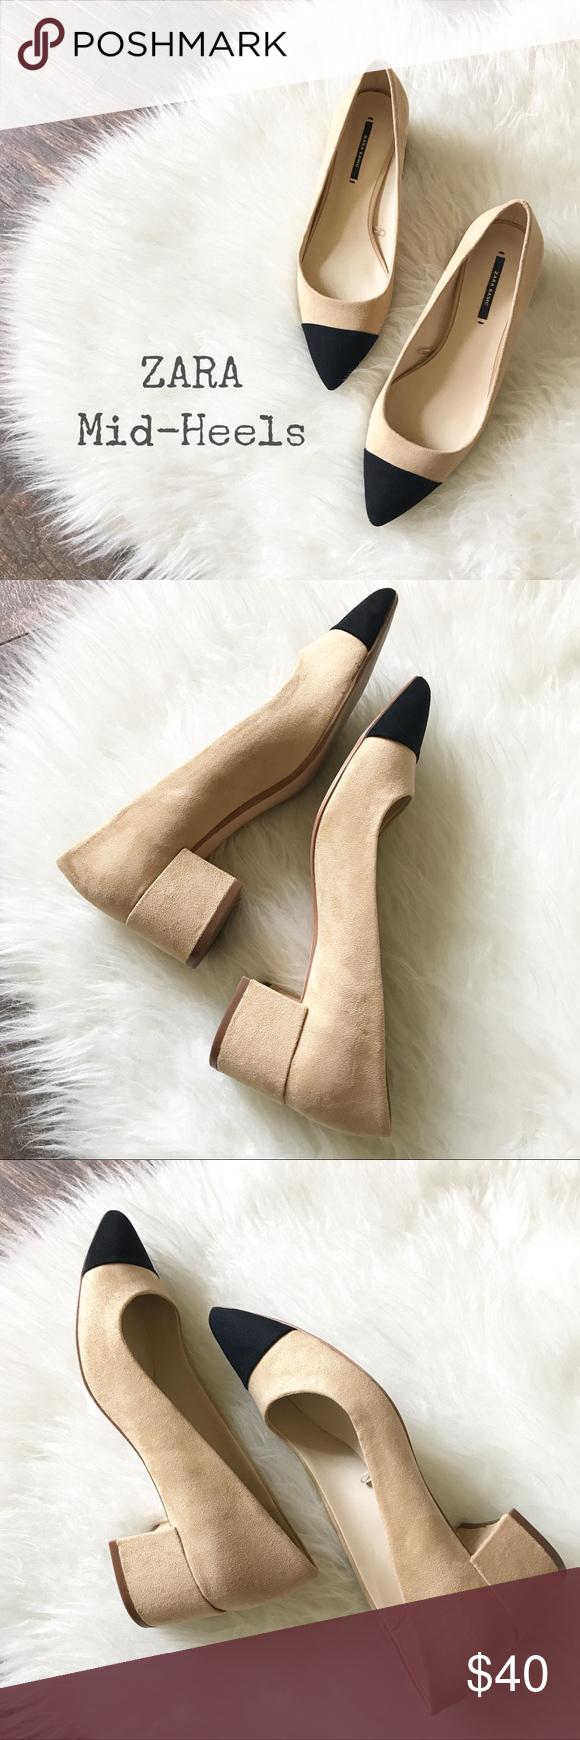 25a5b56b0ce0 Mid-Heel Shoes w  Contrasting Toe Cap by ZARA Size 37 EU 6.5 US Zara ...